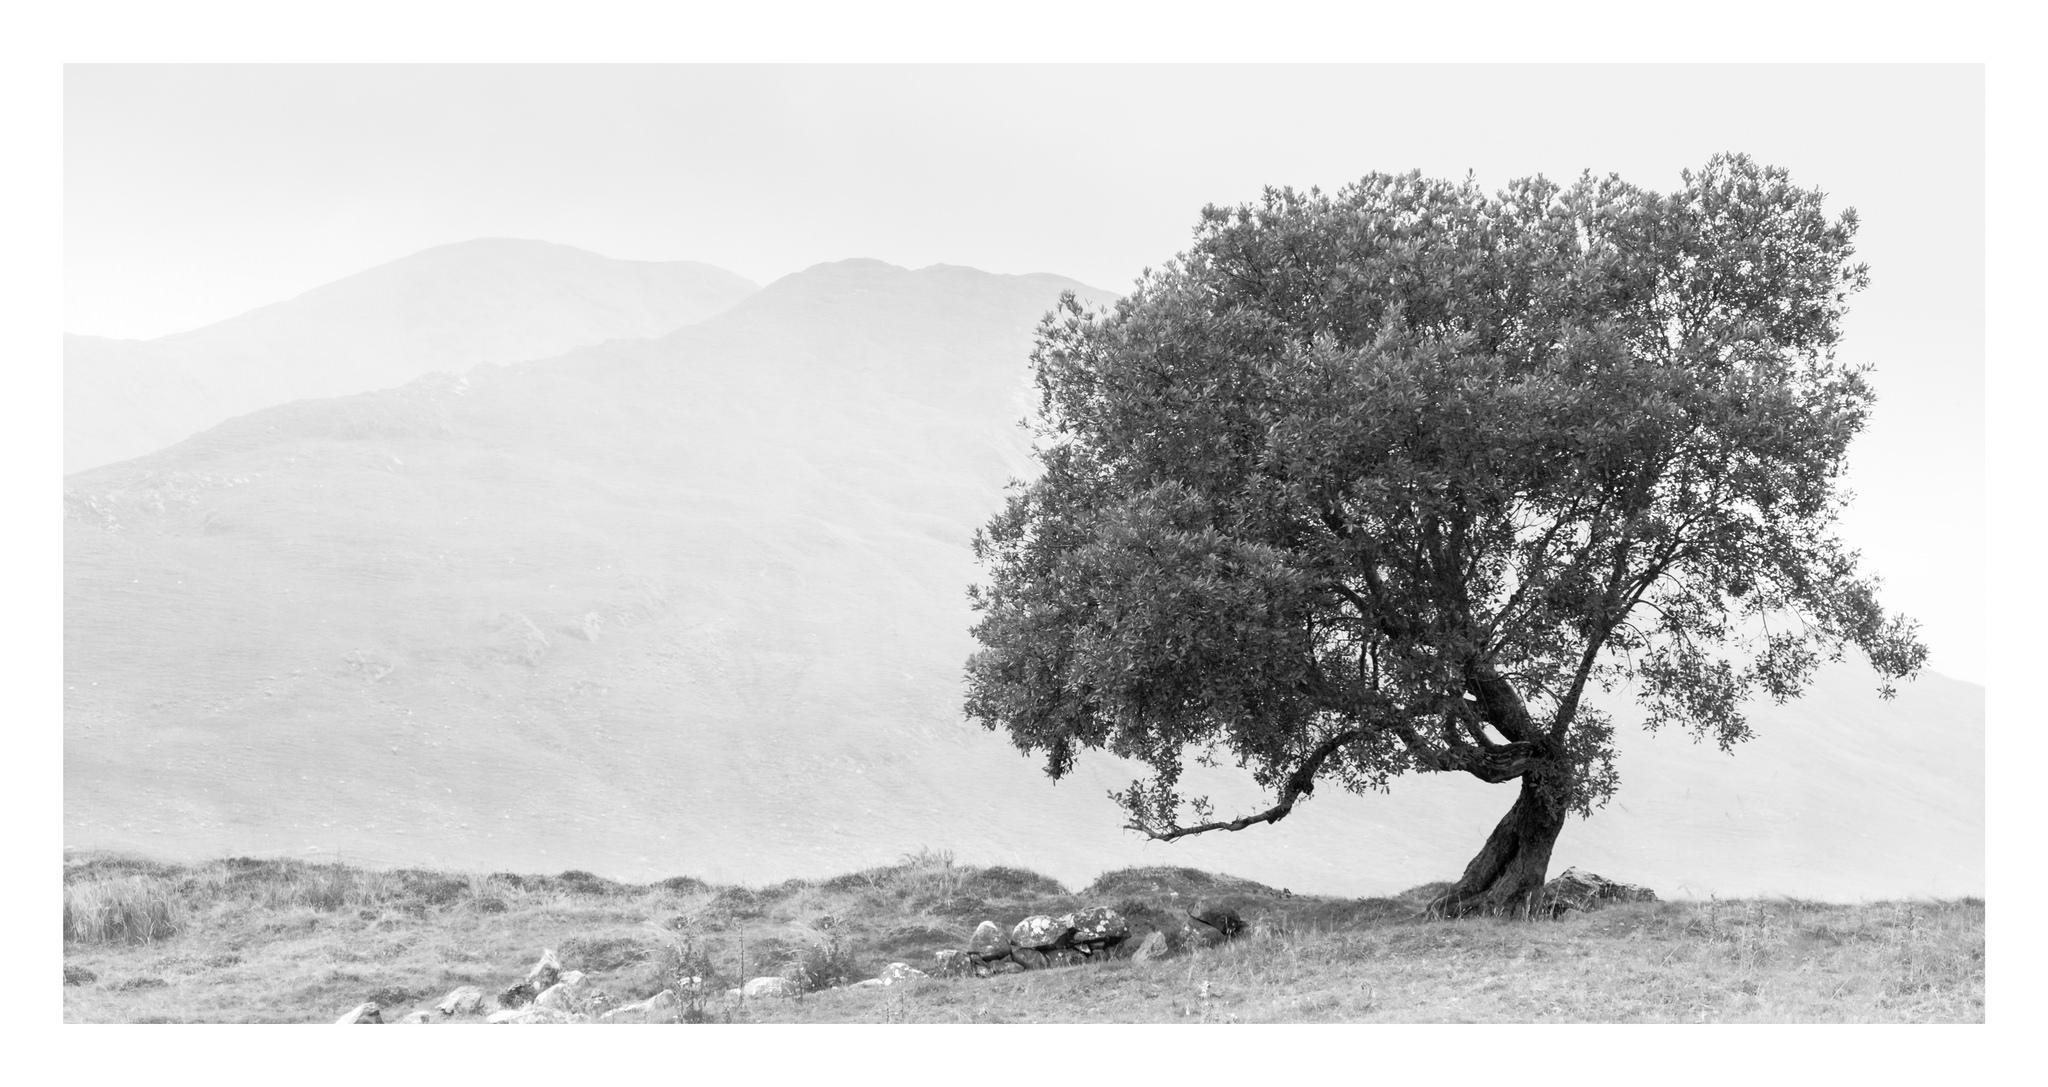 Logh Na fooey Lone tree in Connemara